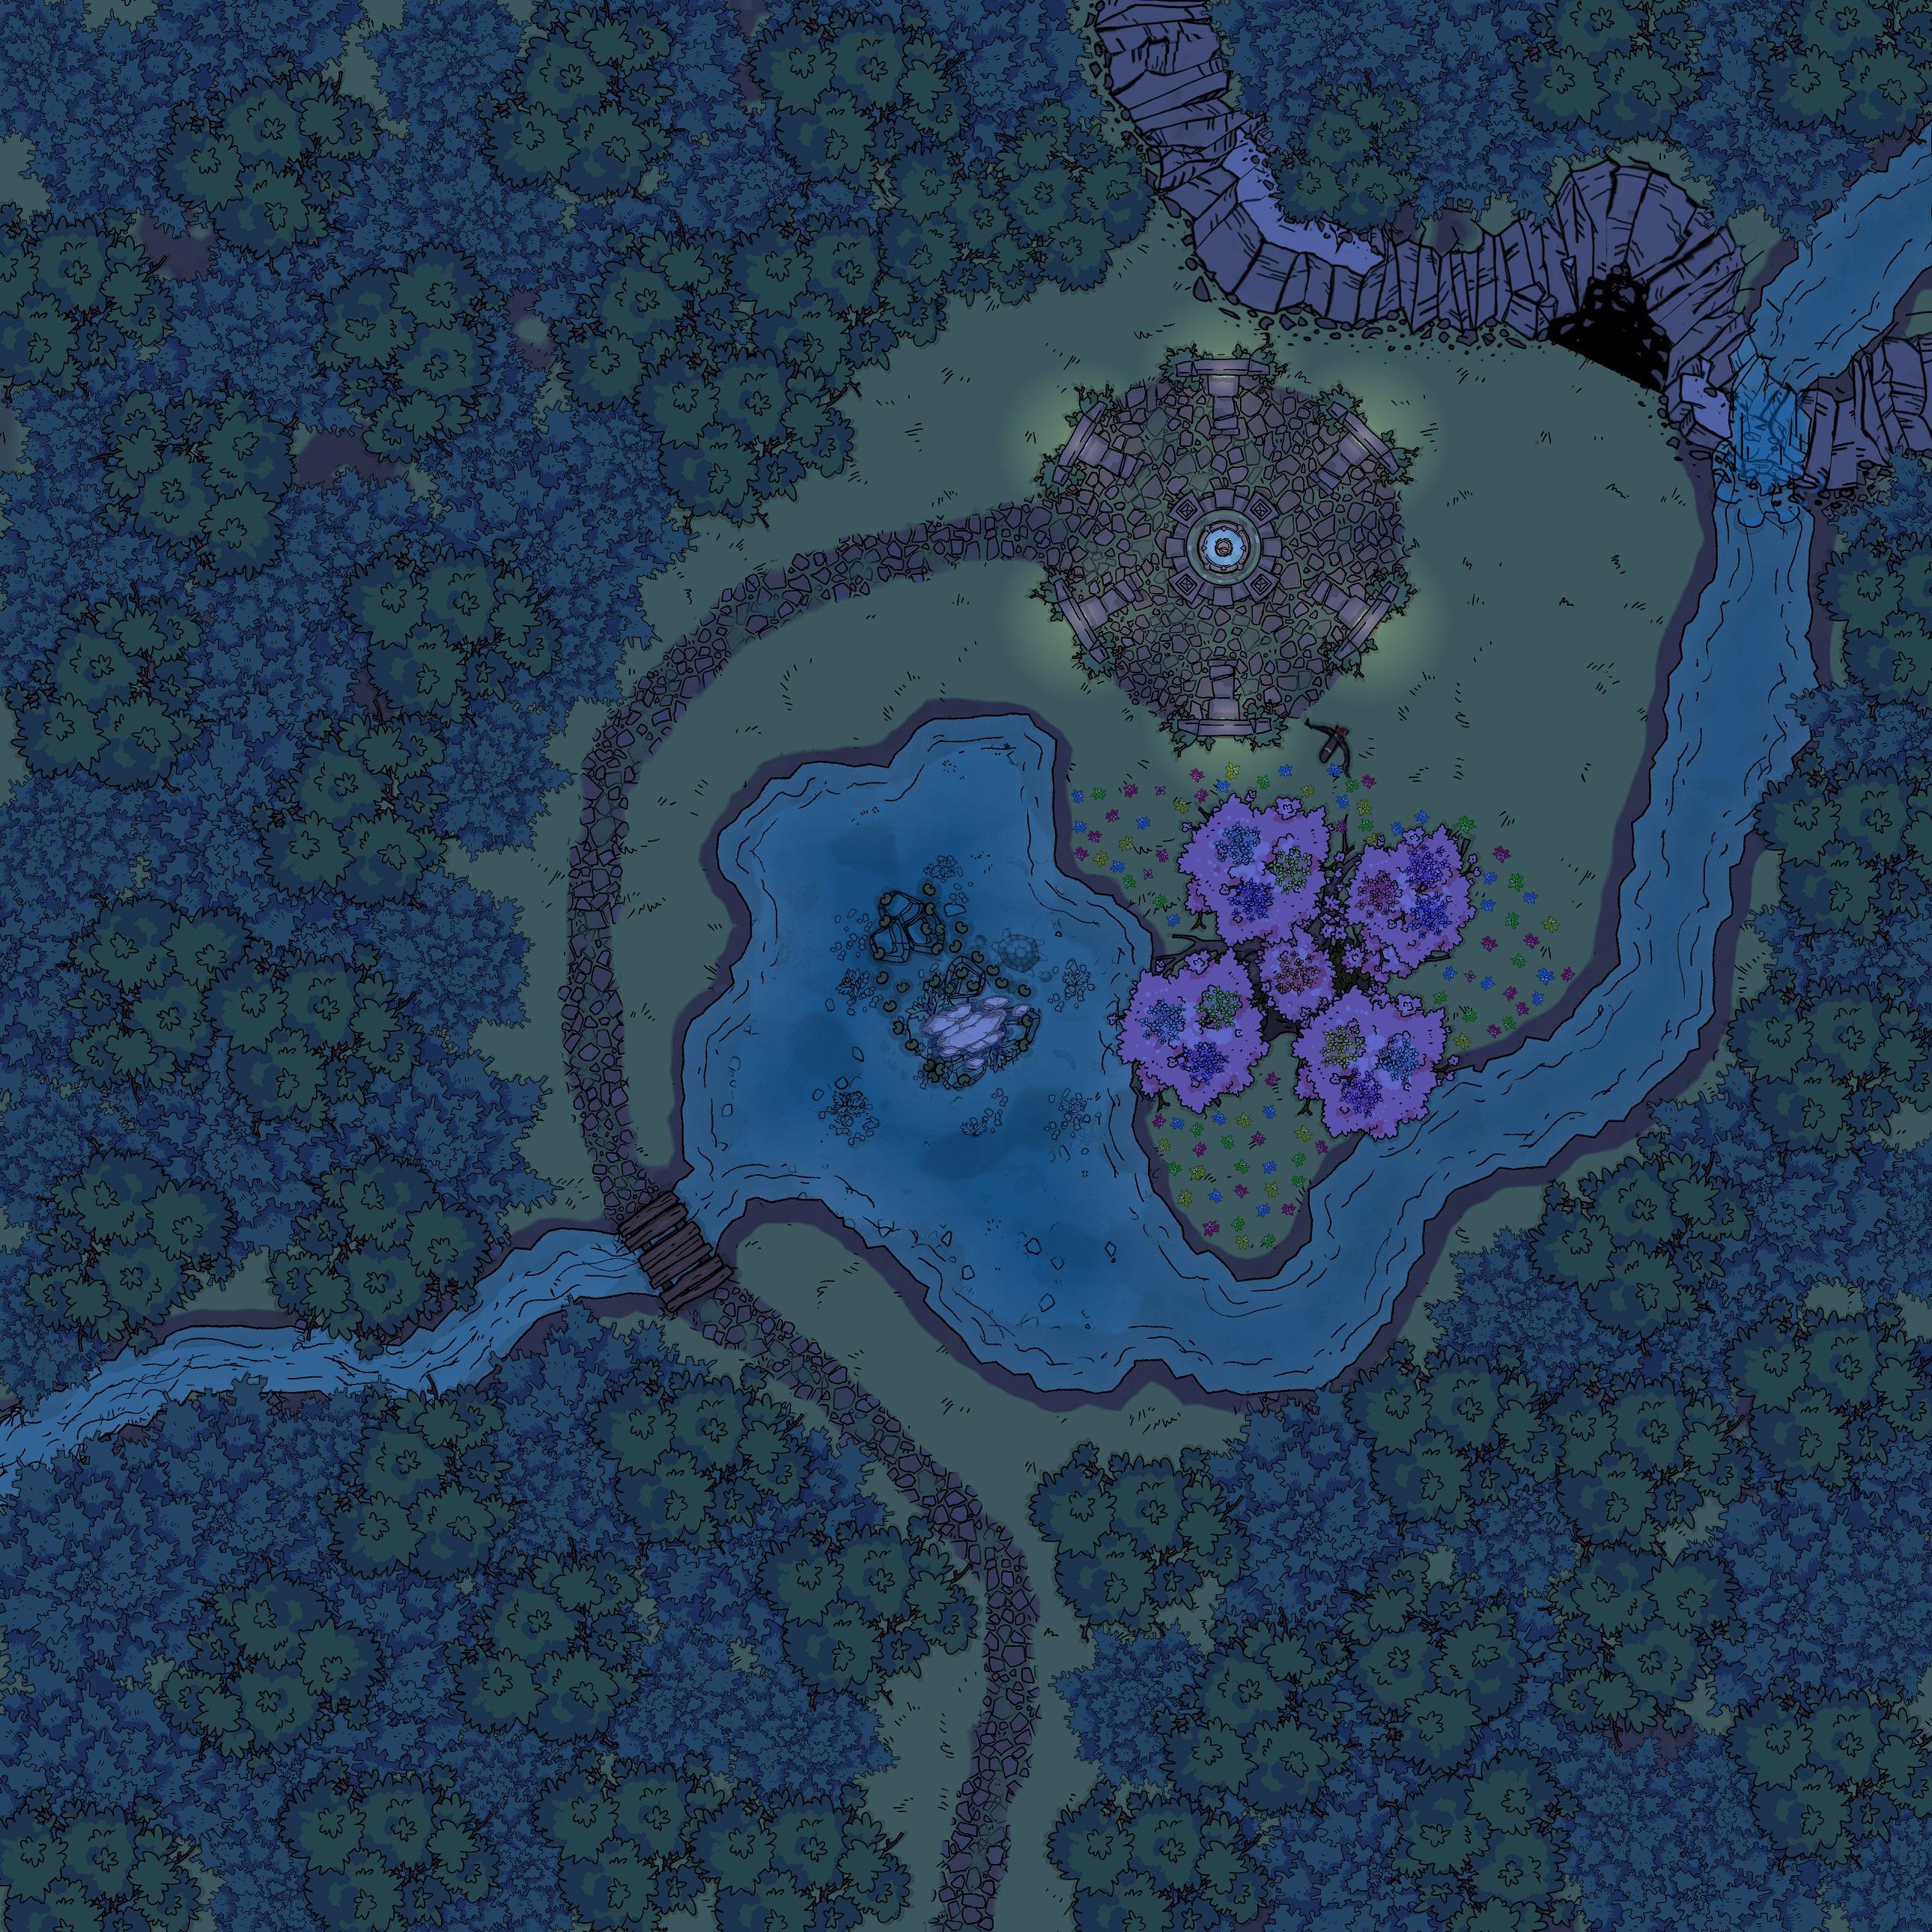 Druid Grove night no grid reduced 30 x 30.jpg